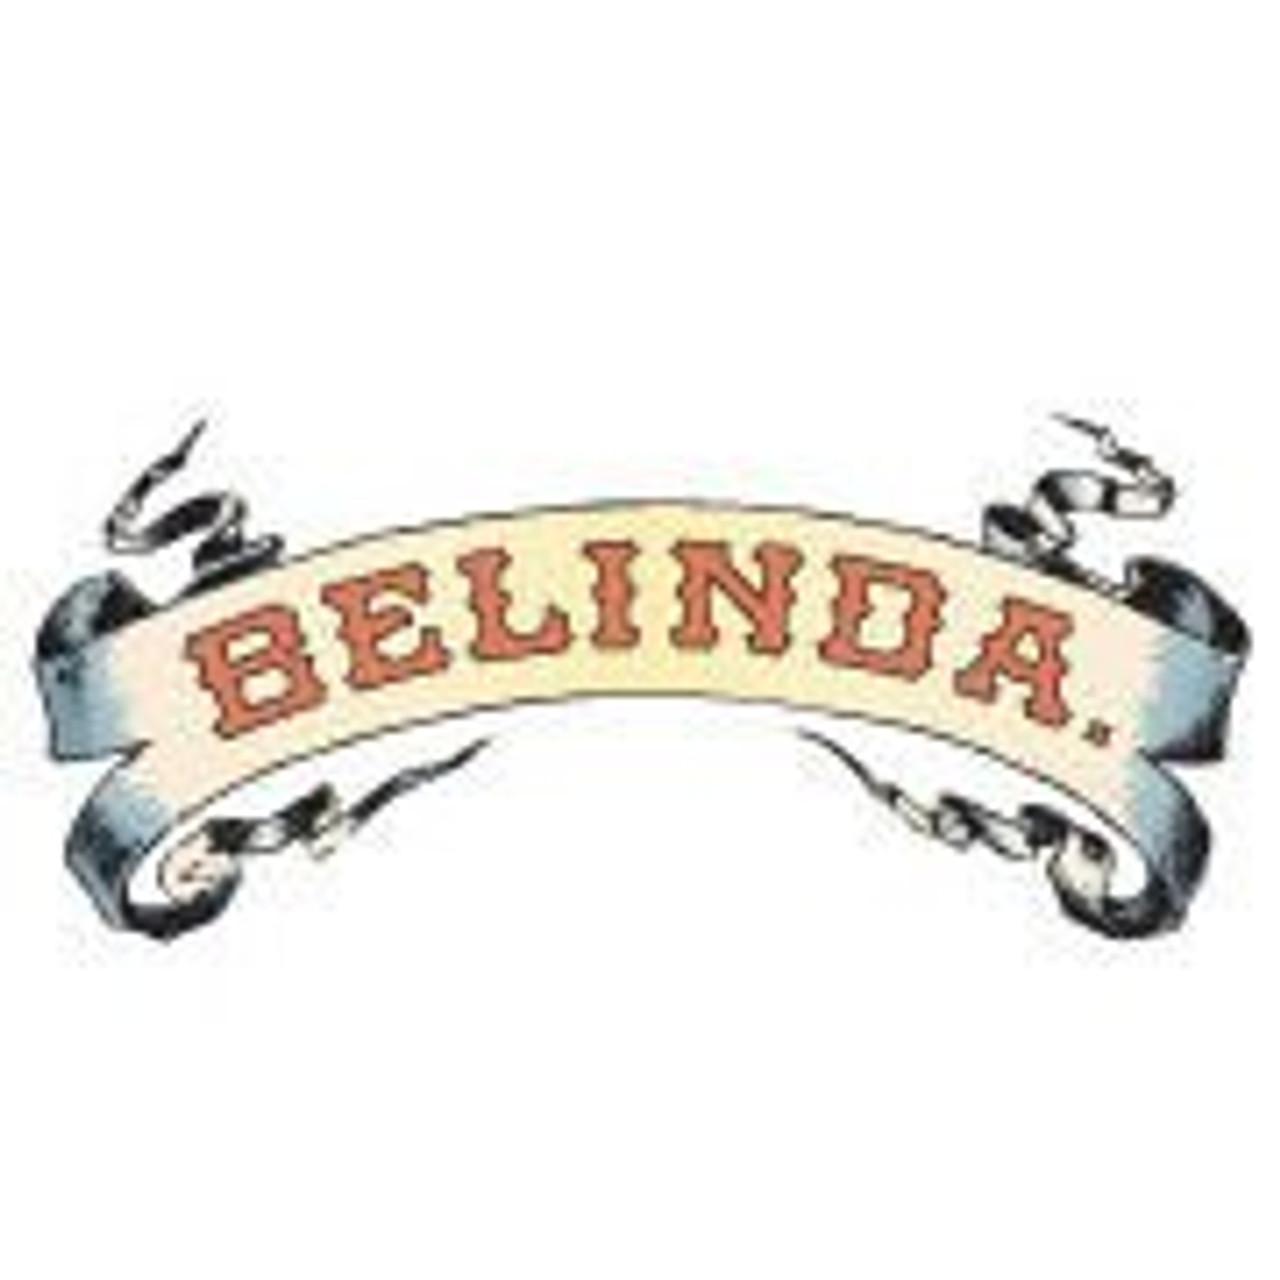 Belinda Prominente (Cedar Wrap) Cigars - 7 x 50 (Pack of 5)